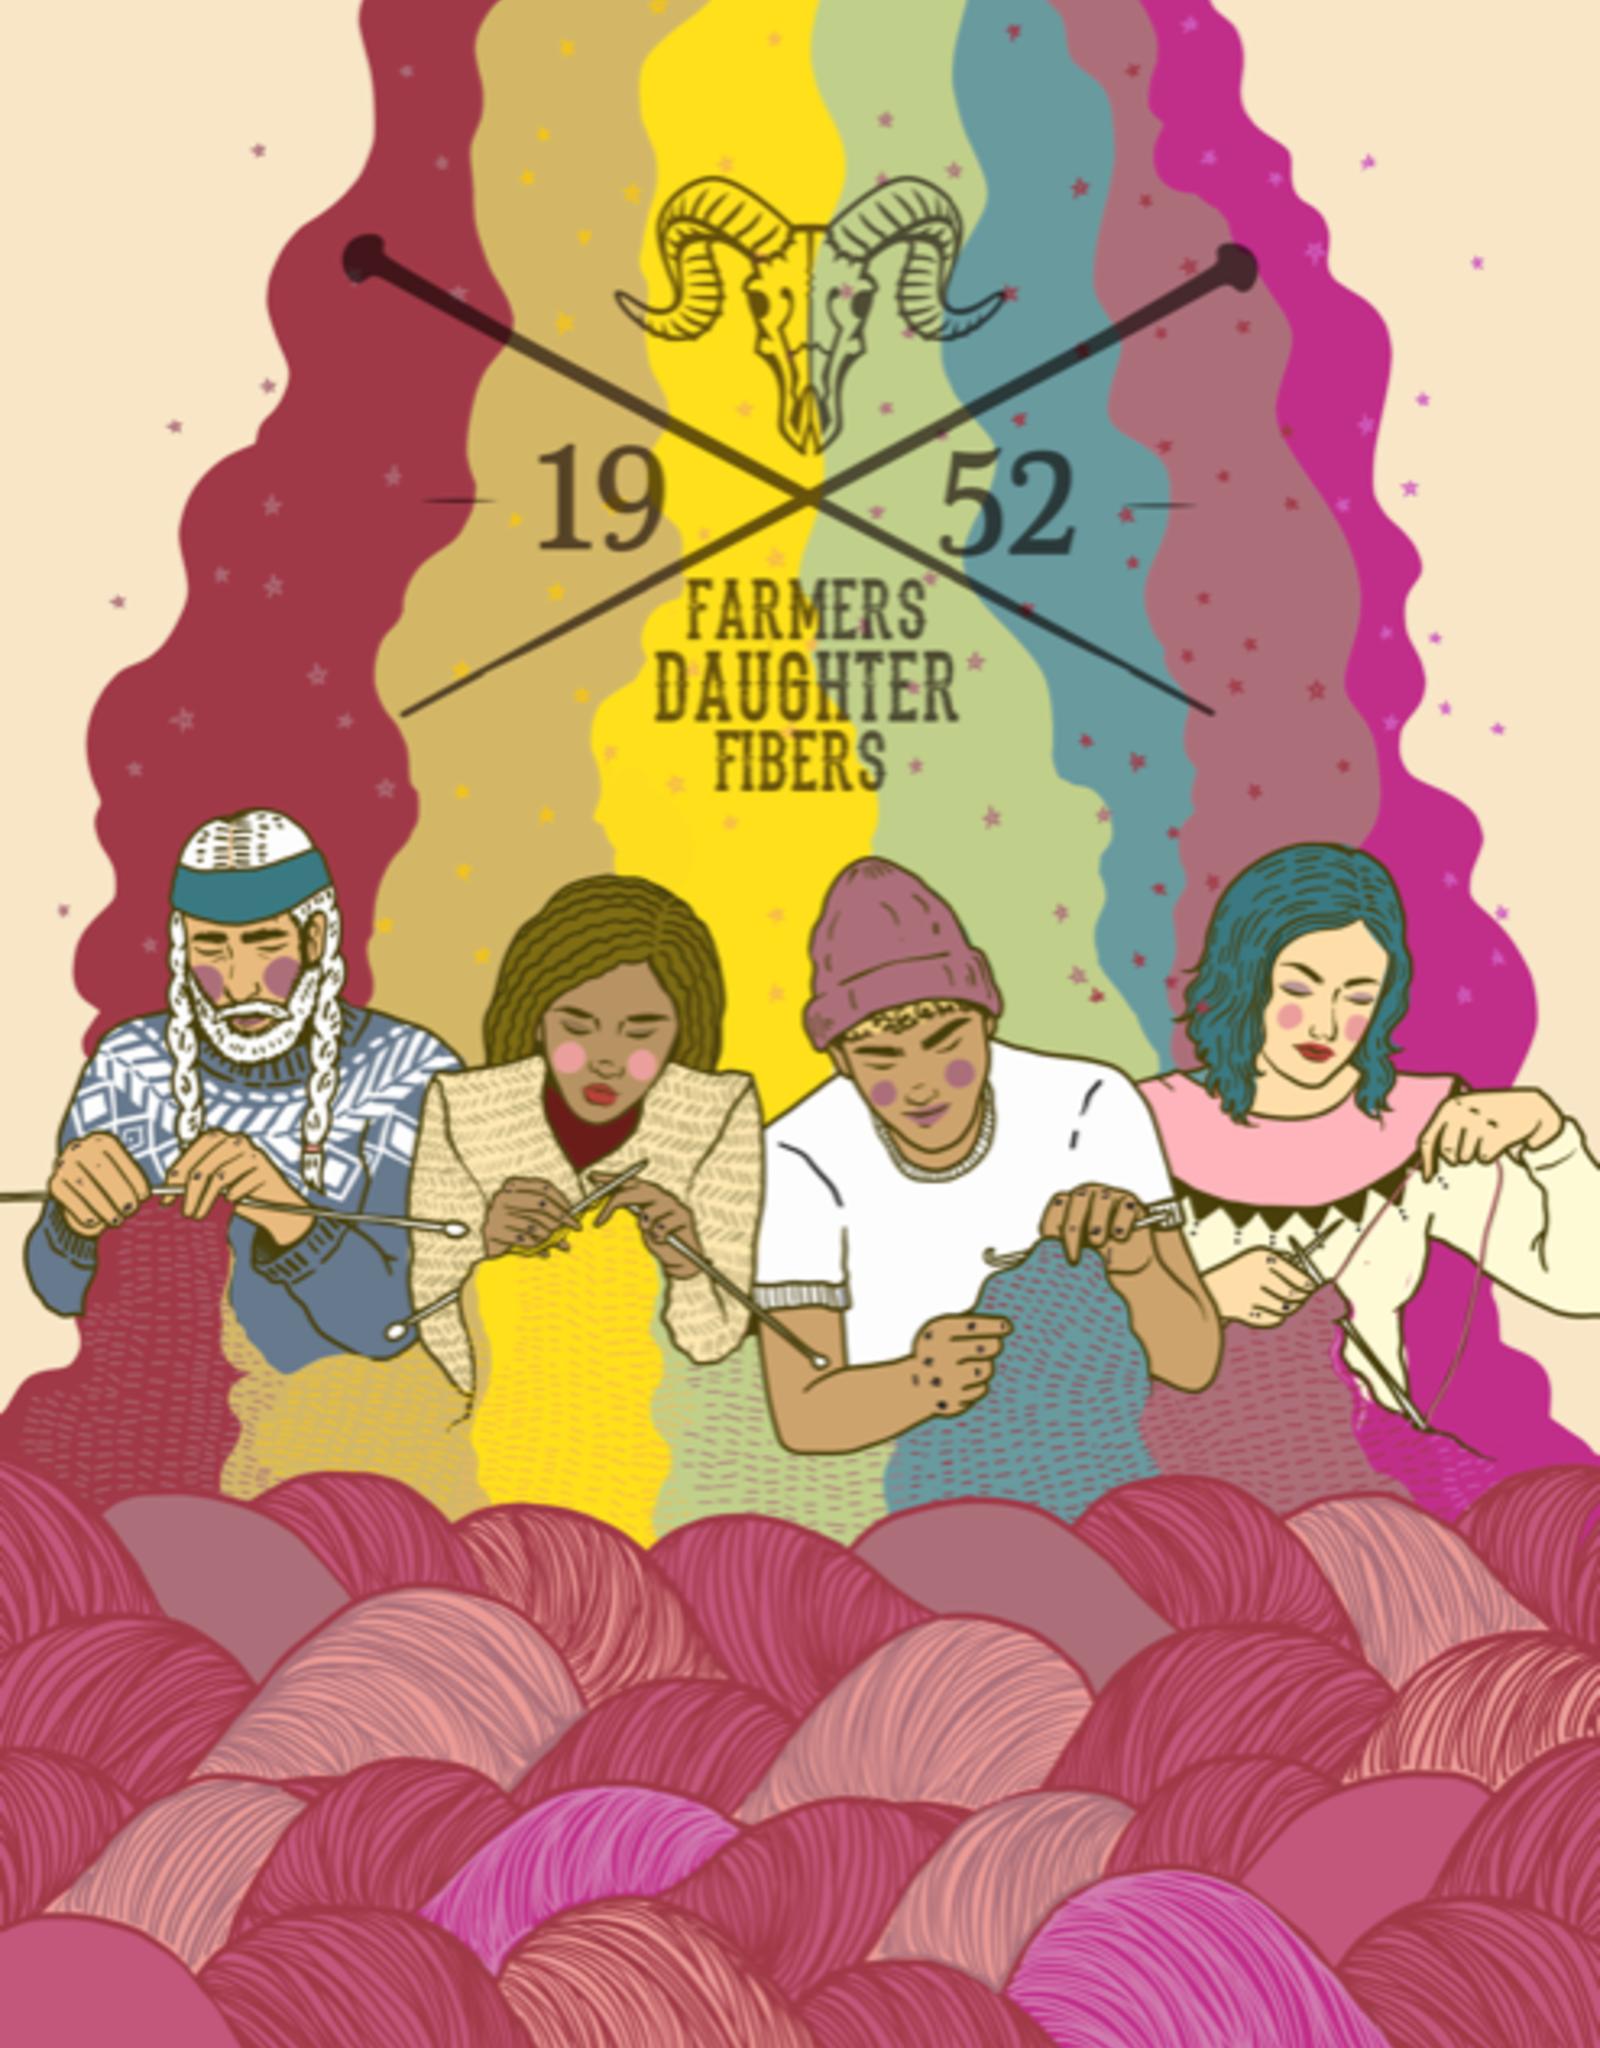 The Farmer's Daughter Fibers Summer LYS KCaL 2020